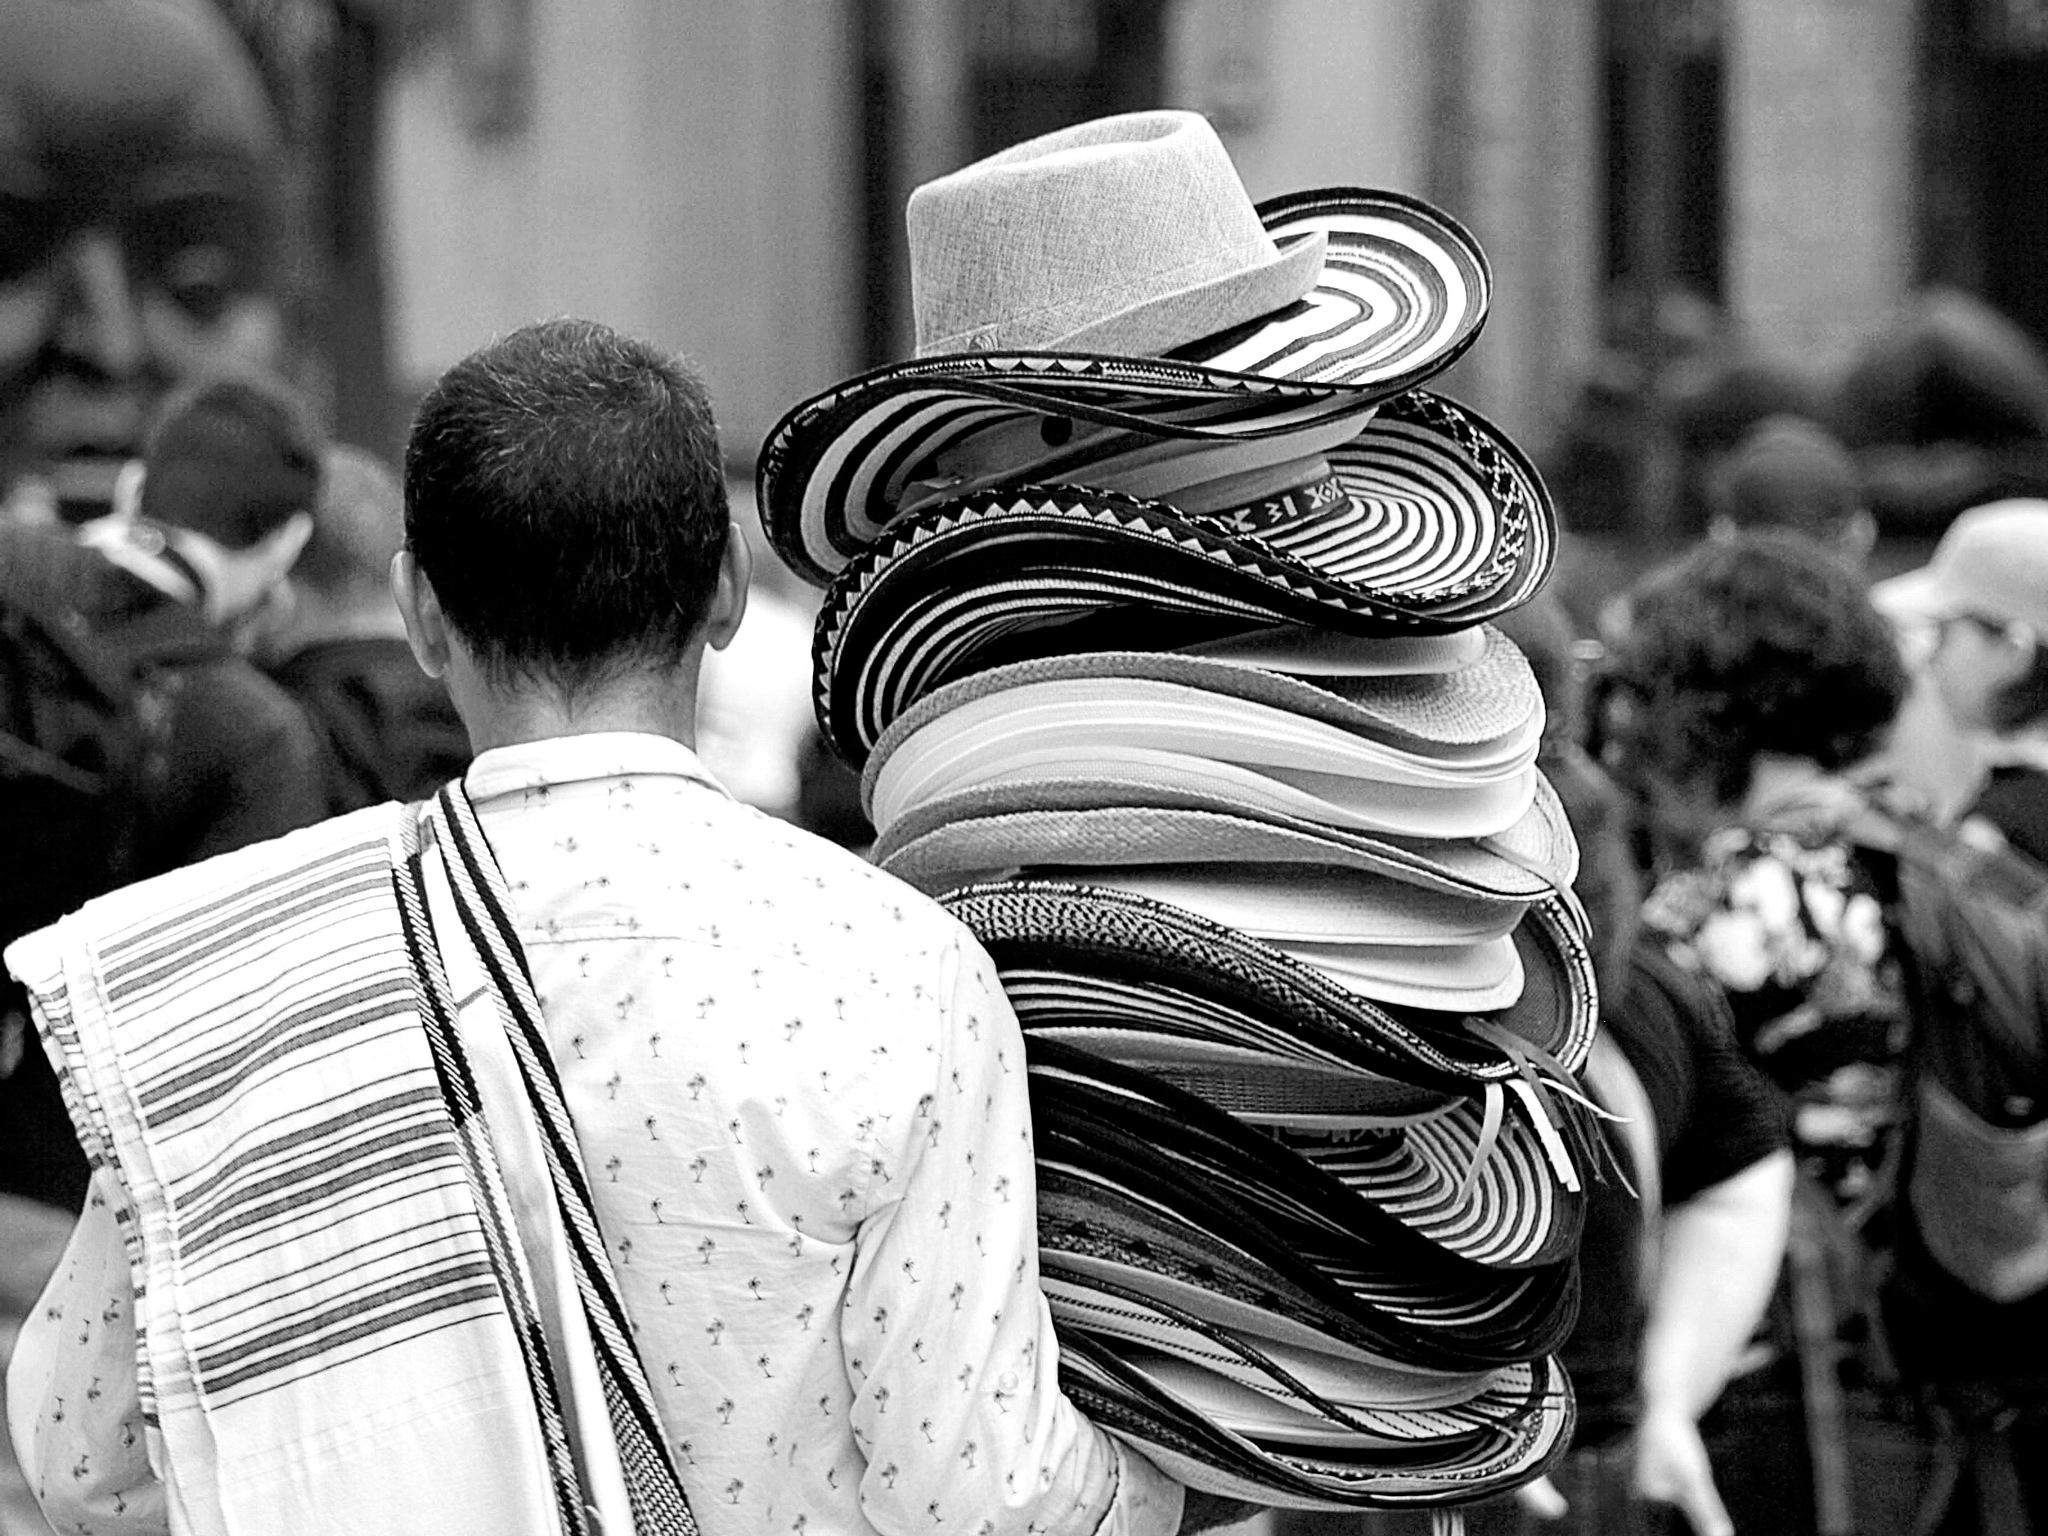 Untitled by carlosalbertoechavarriamontoya